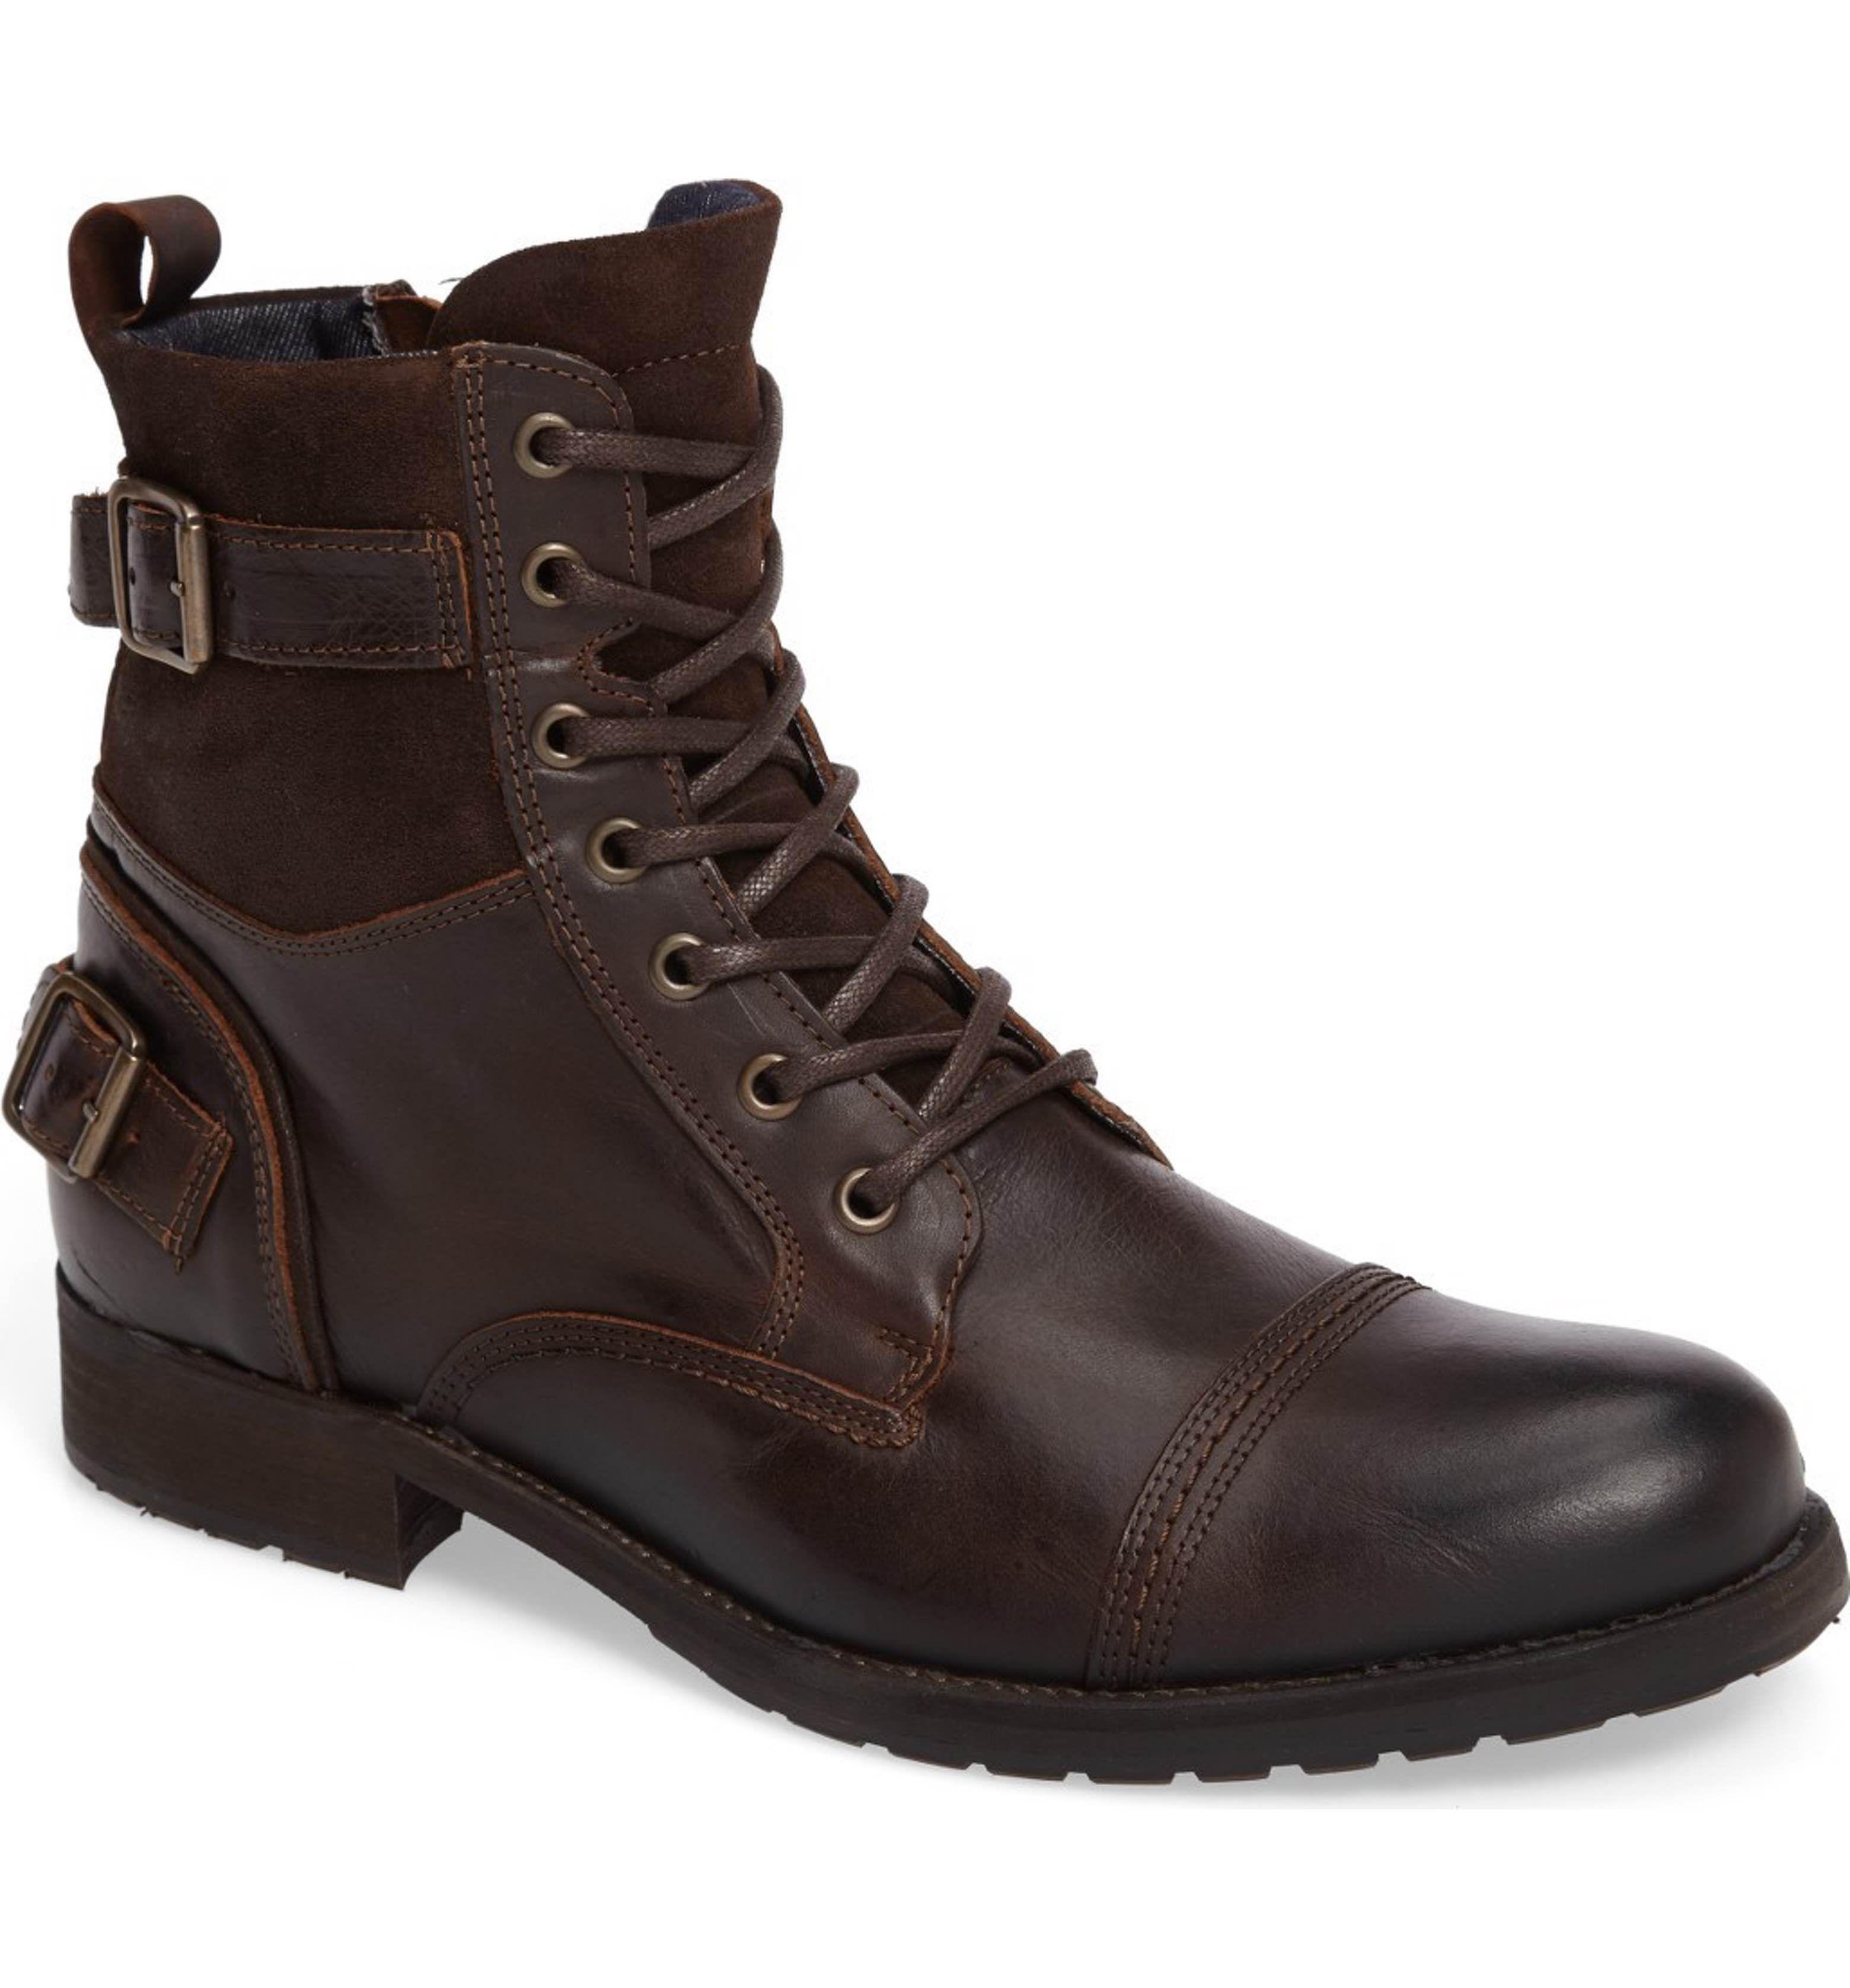 bde05ff37f ALDO Gerrade Cap Toe Boot (Men) Designer Boots, Aldo, Fashion Boots,